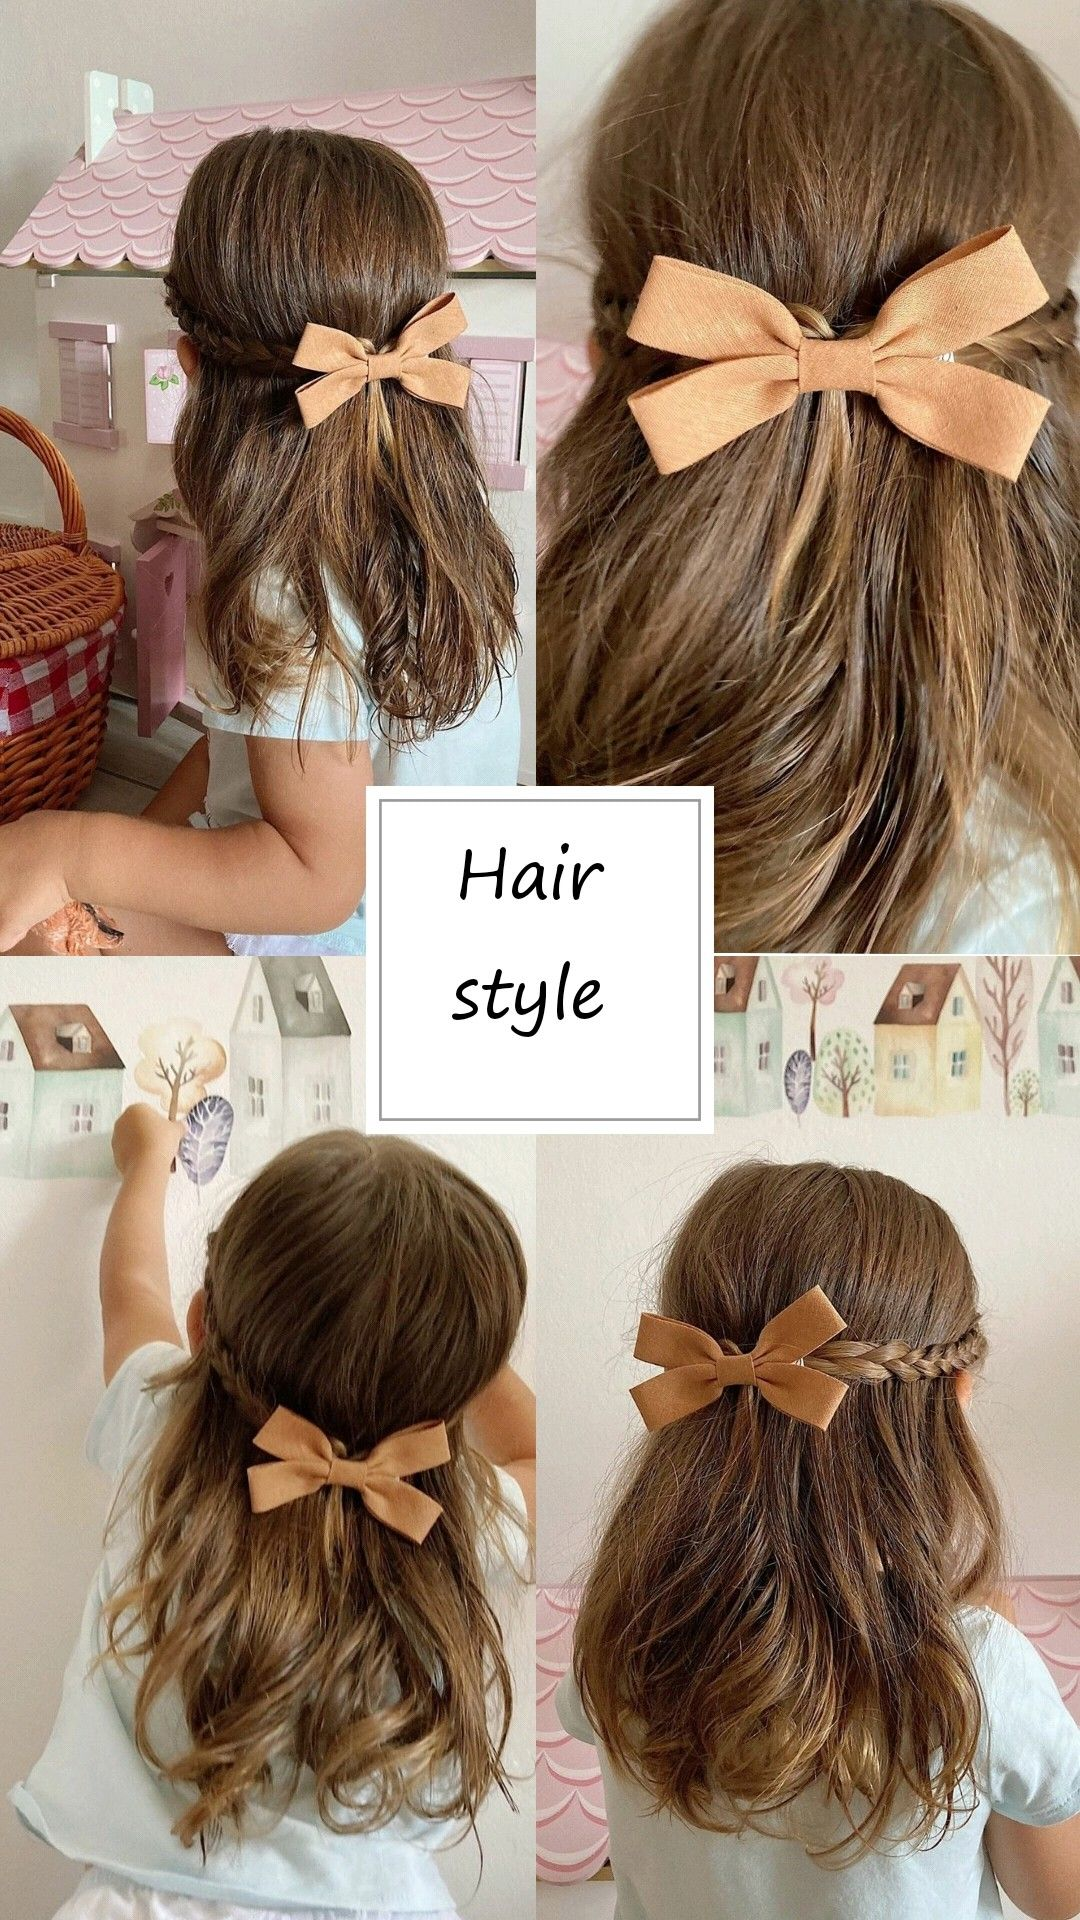 Baby Hair Clip Summer Hair Bows Toddler Hair Clip Girl Hair Clip Birthday Gift For Girls Boho Bows Pigtail Bows Boho Bows In 2021 Girl Hair Dos Flower Girl Hairstyles Baby